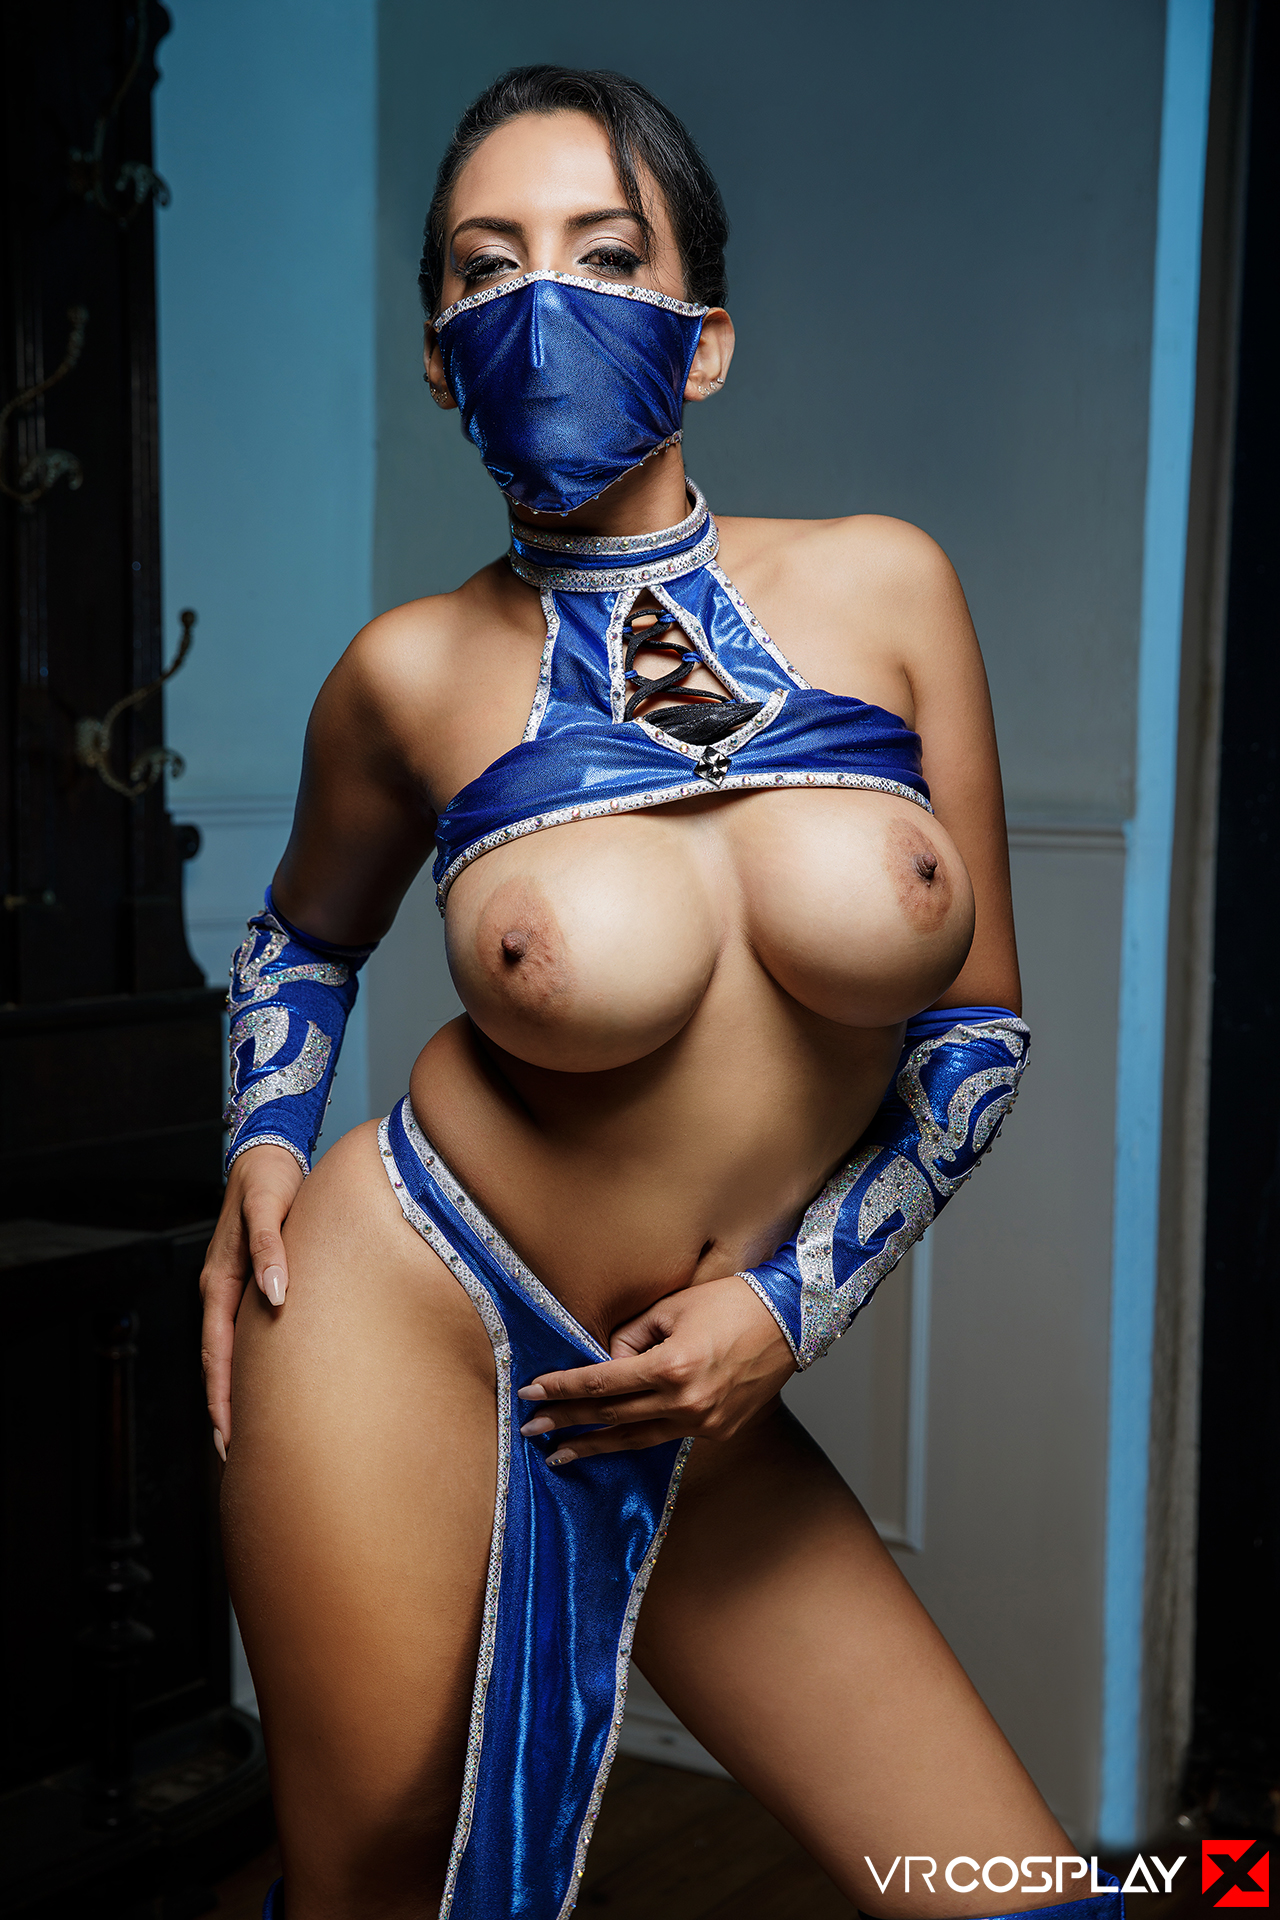 Katrina Moreno Mortal Kombat XXX Cosplay 4